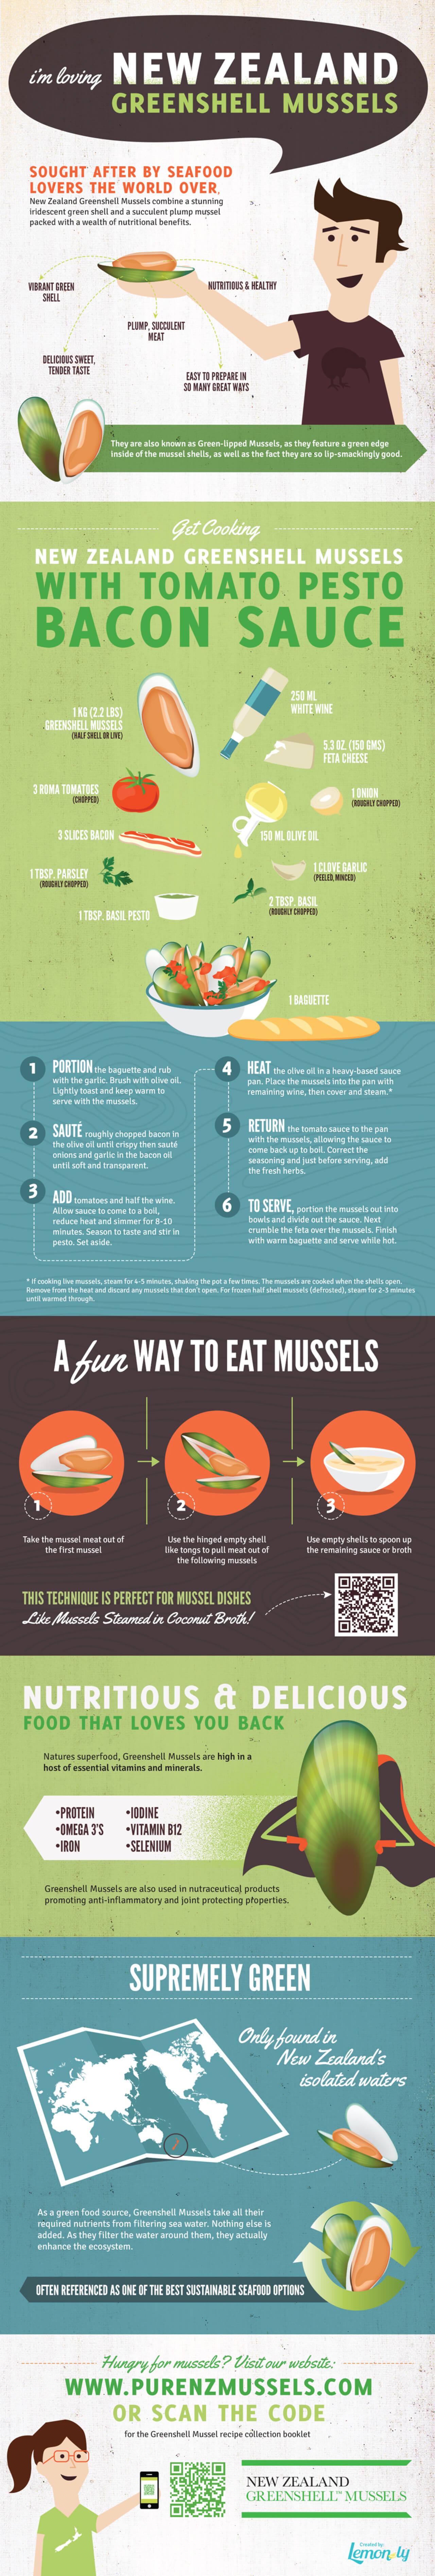 Best Infographics: I'm Loving New Zealand Greenshell Mussels